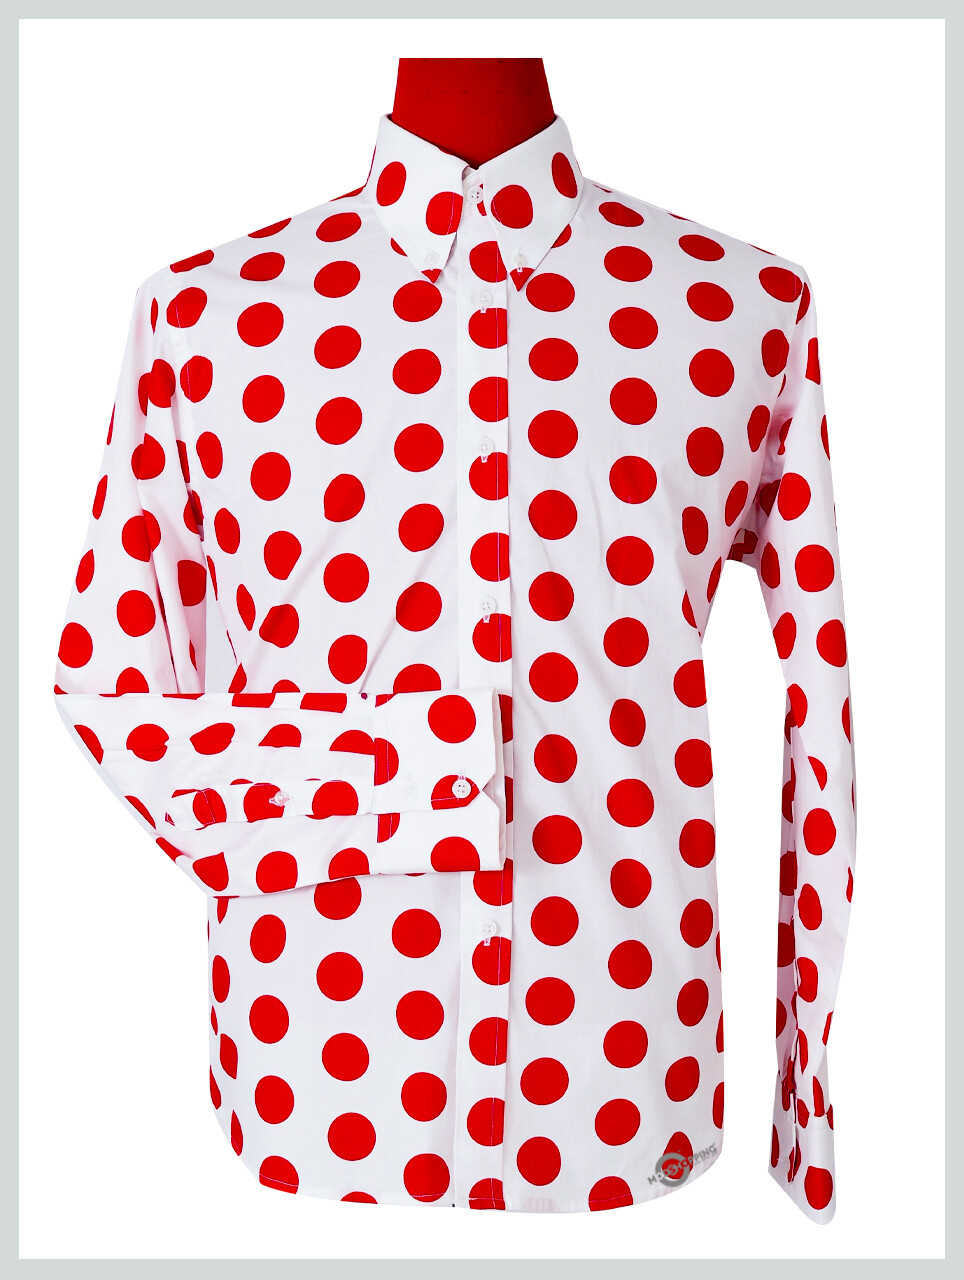 Polka Dot Shirt| Large Red Dot In White Shirt For Man